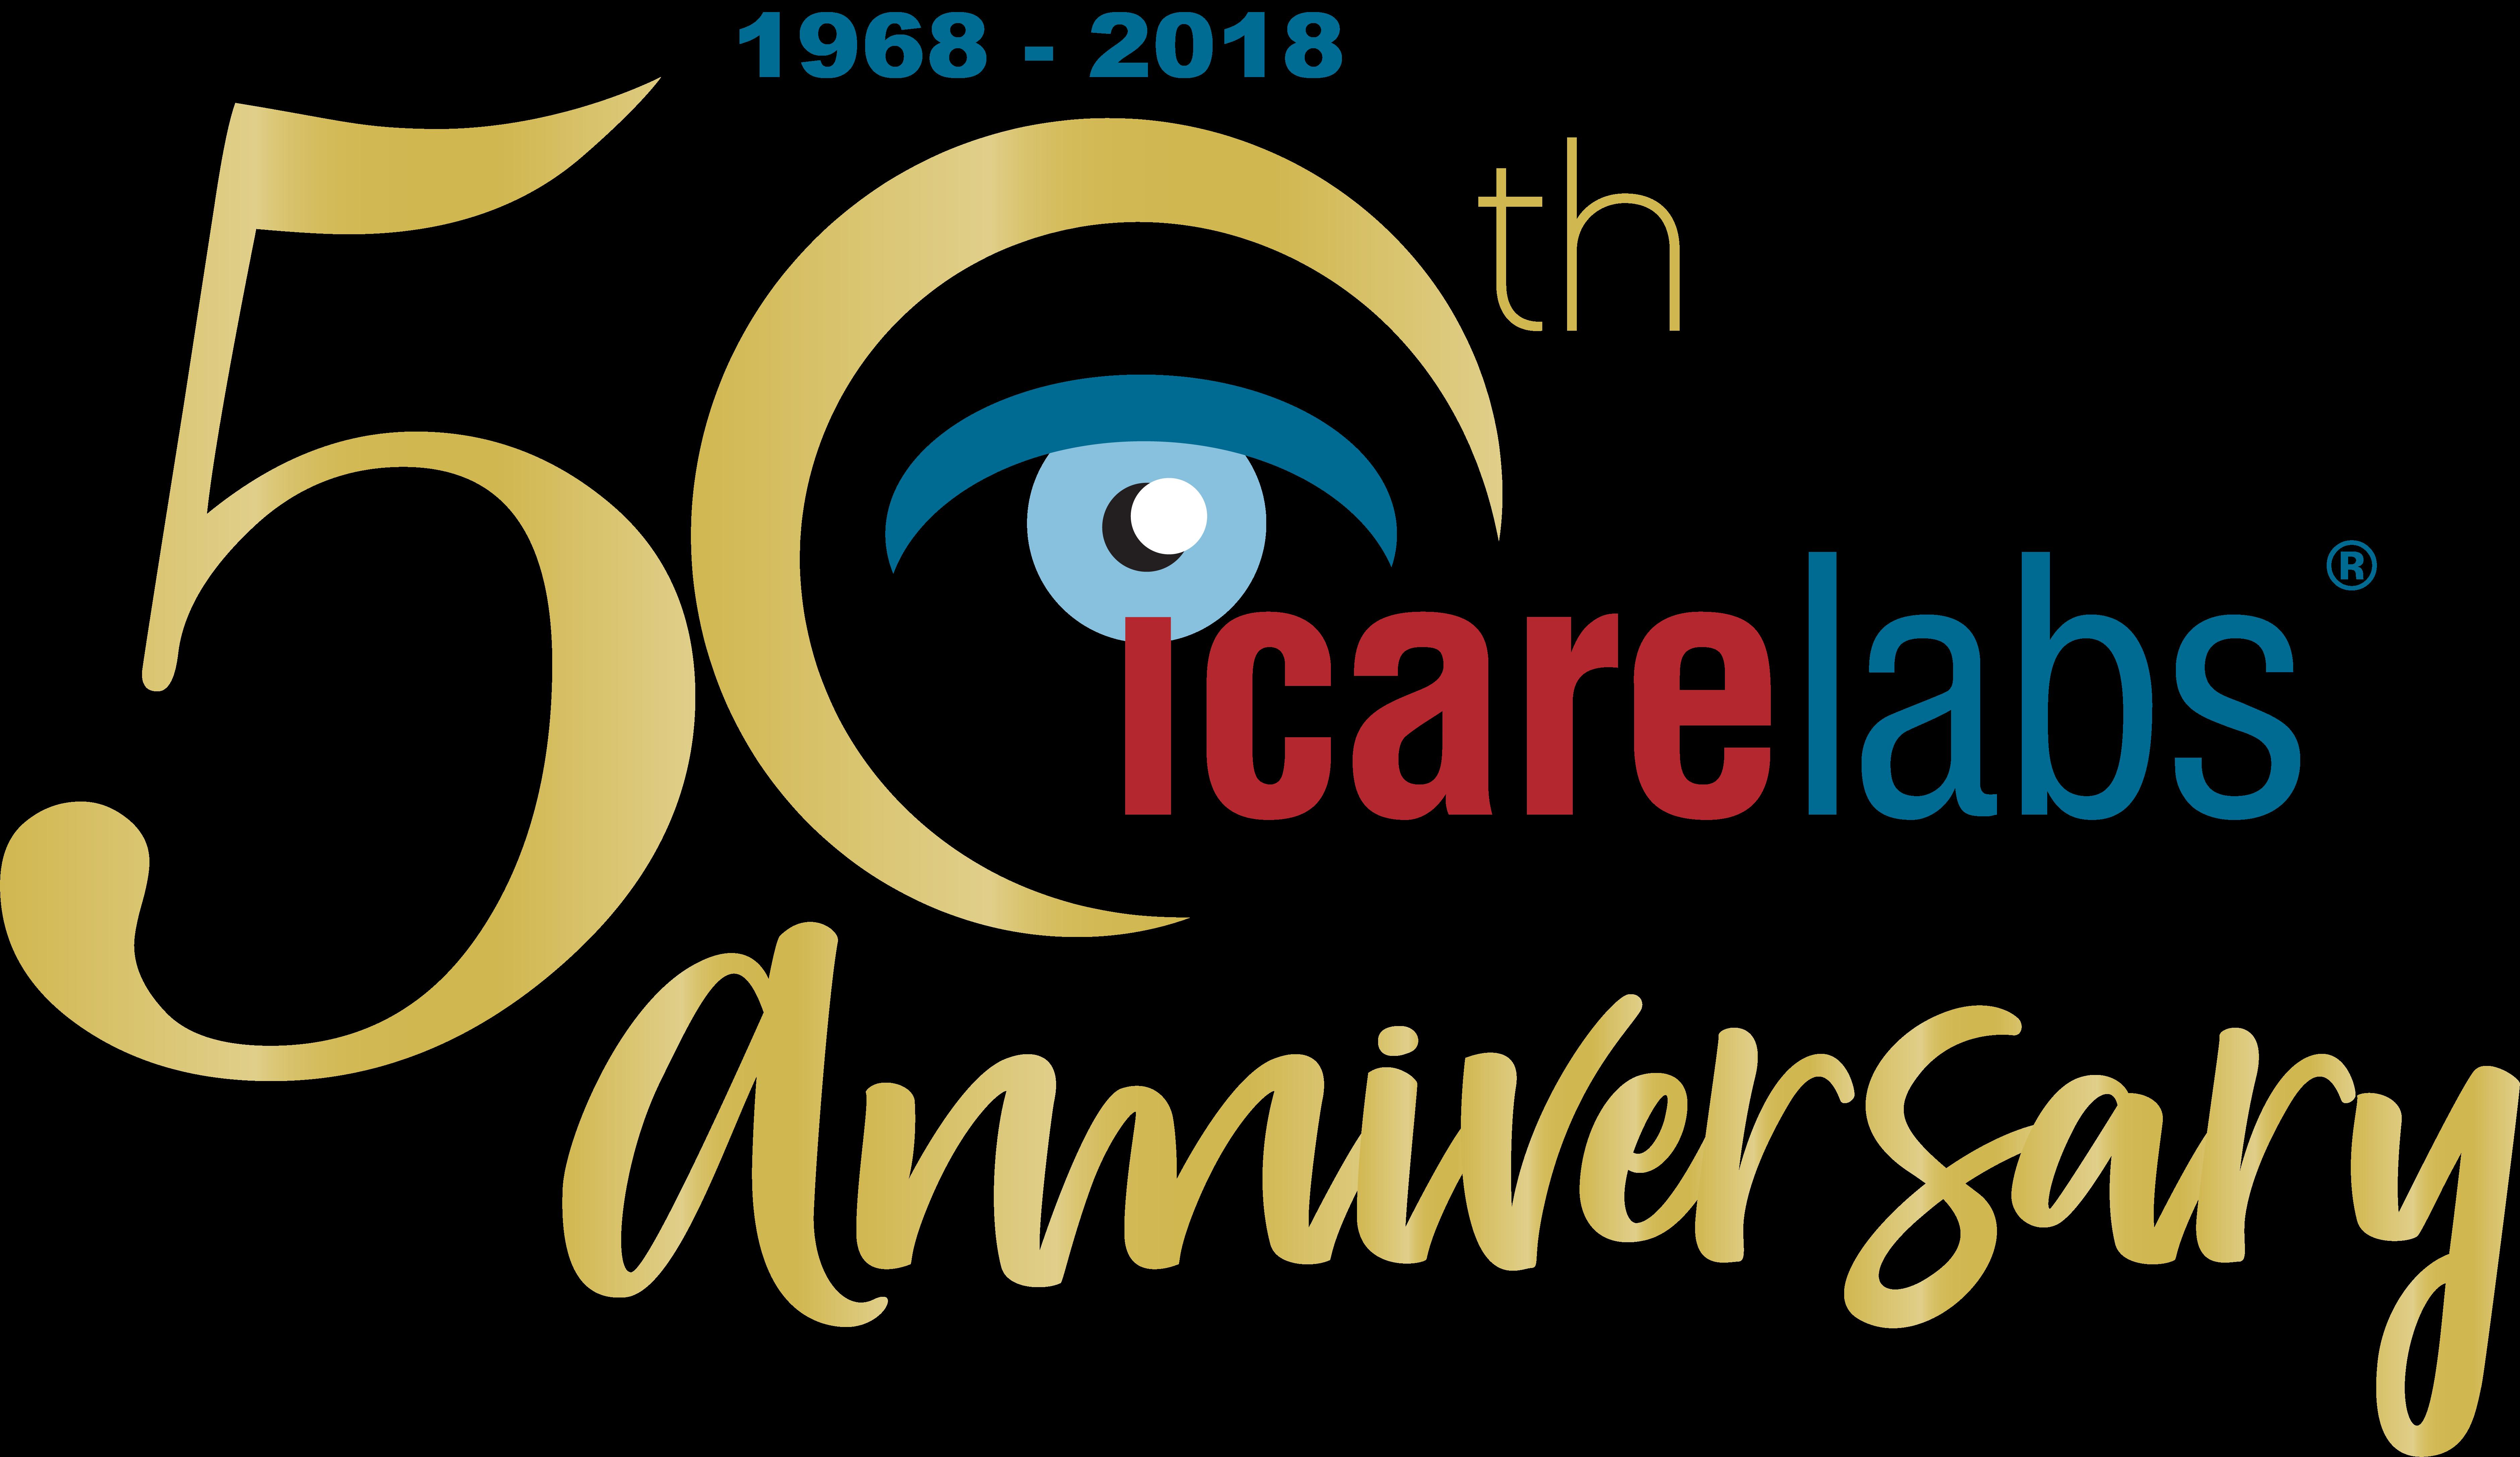 IcareLabs 50th Anniversary!